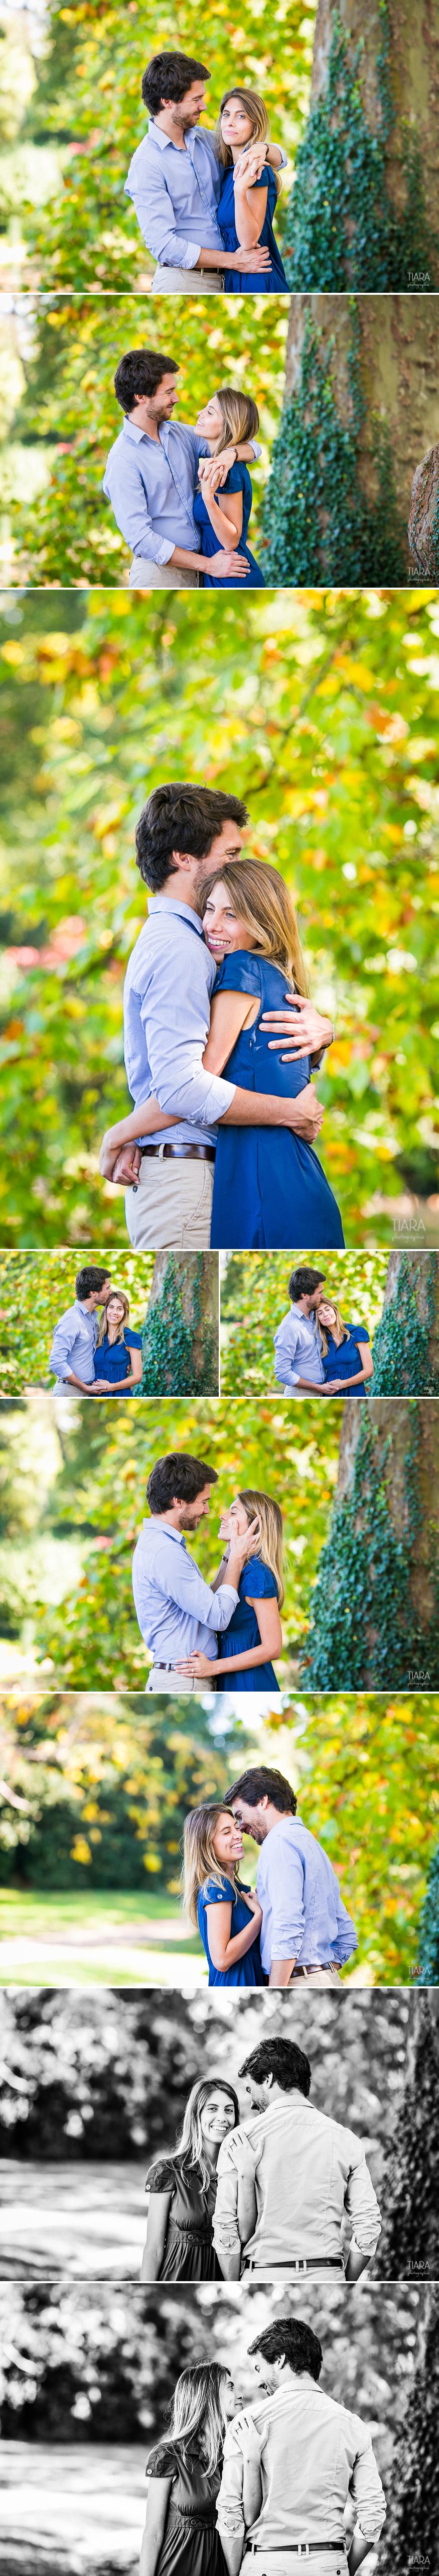 photographe-mariage-provence-réunion